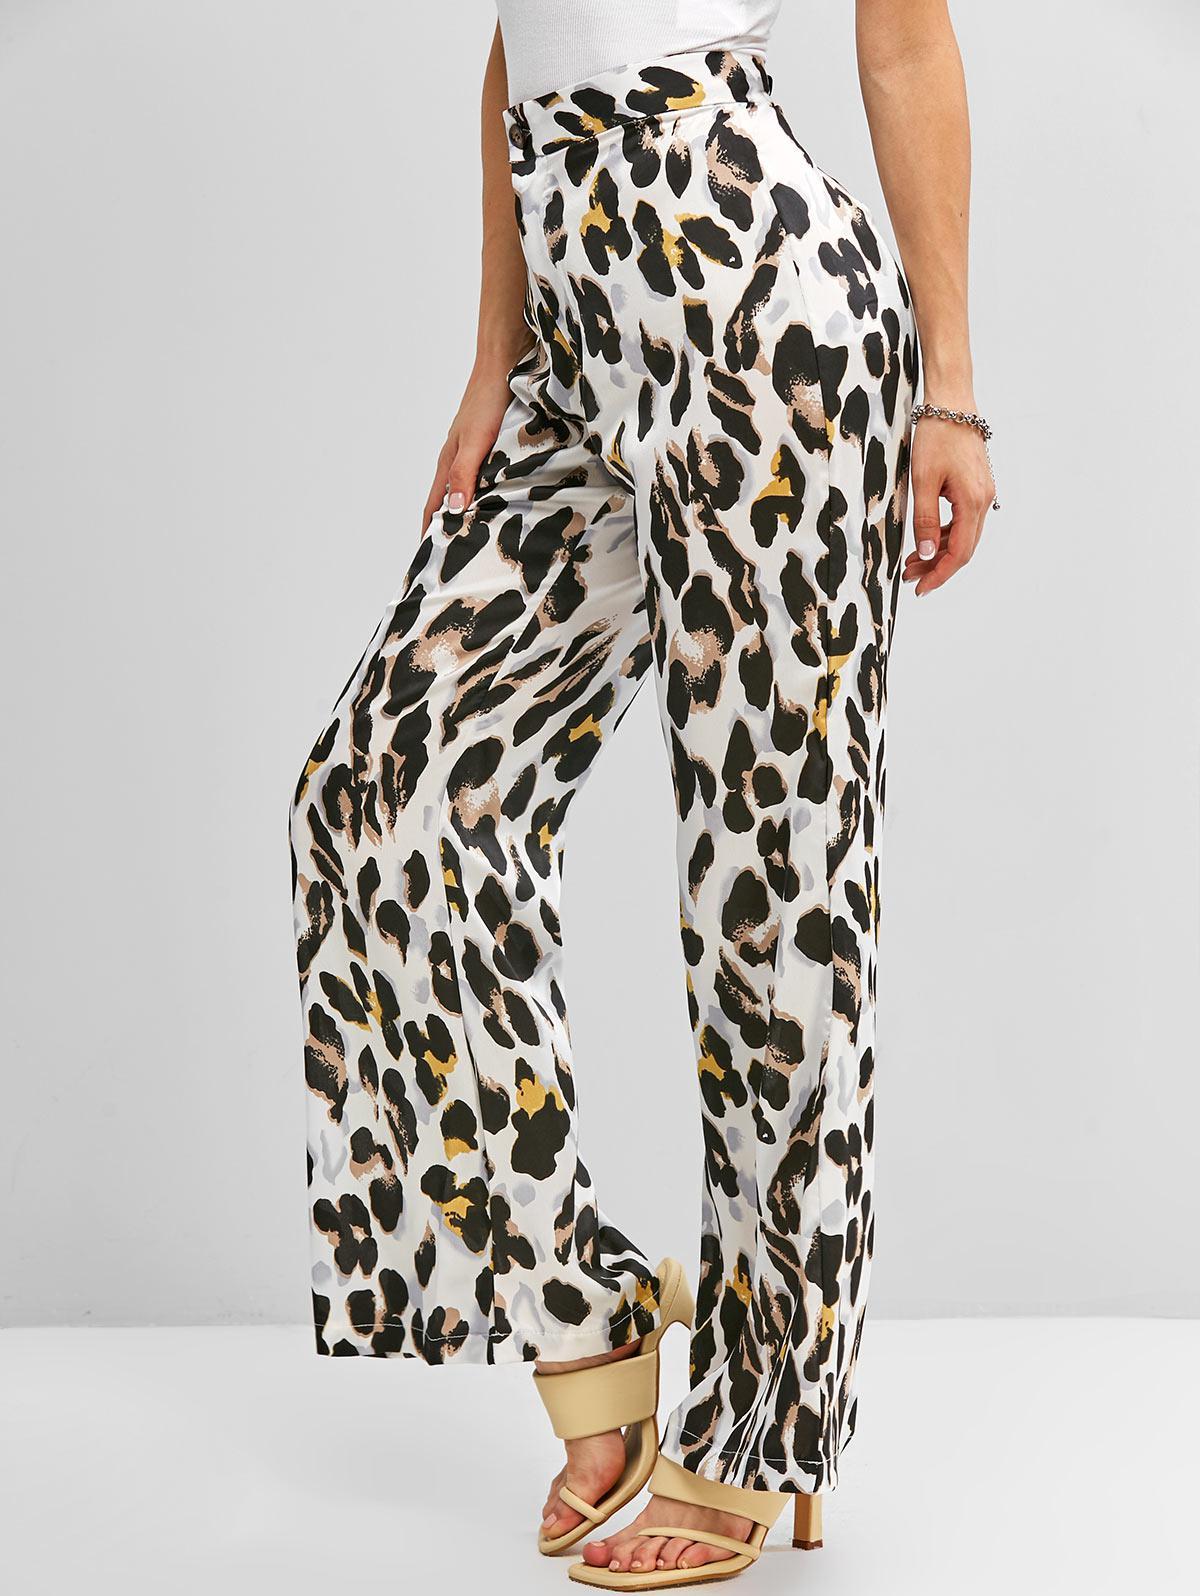 Leopard Animal Print Wide Leg Palazzo Pants